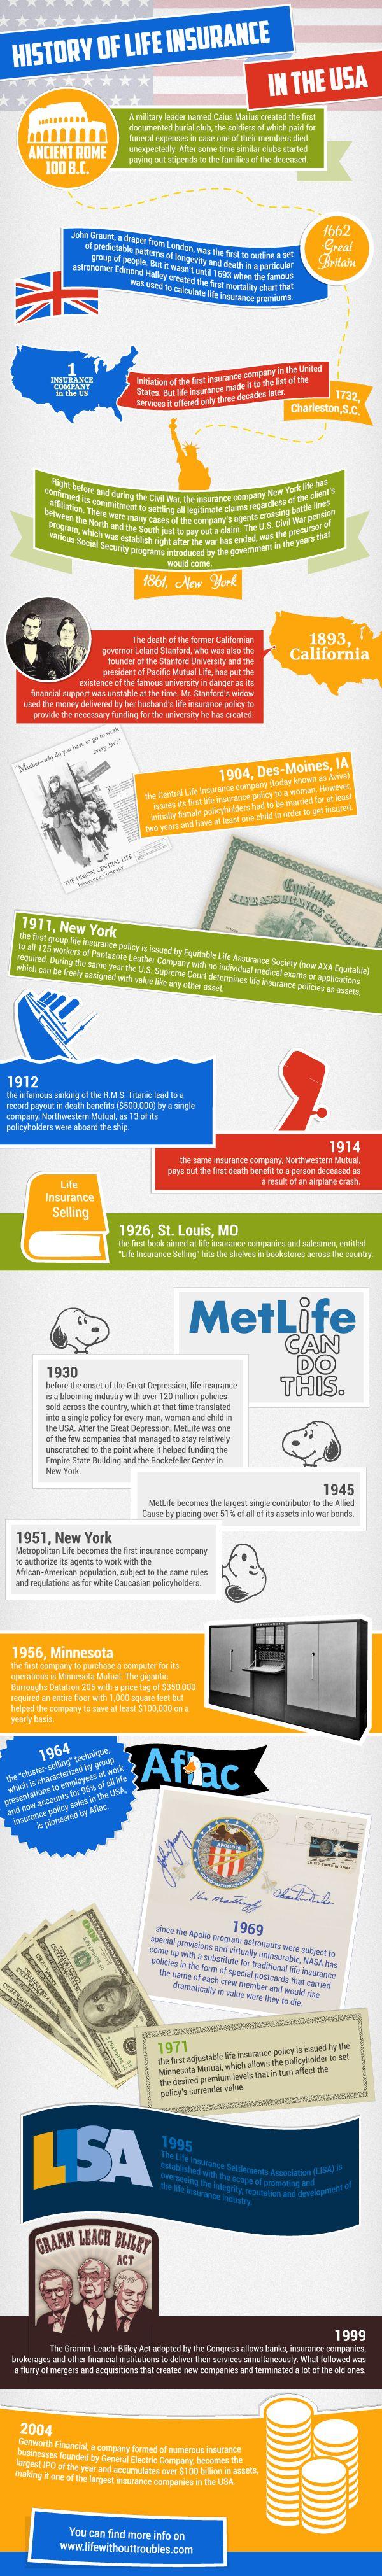 History of Life Insurance